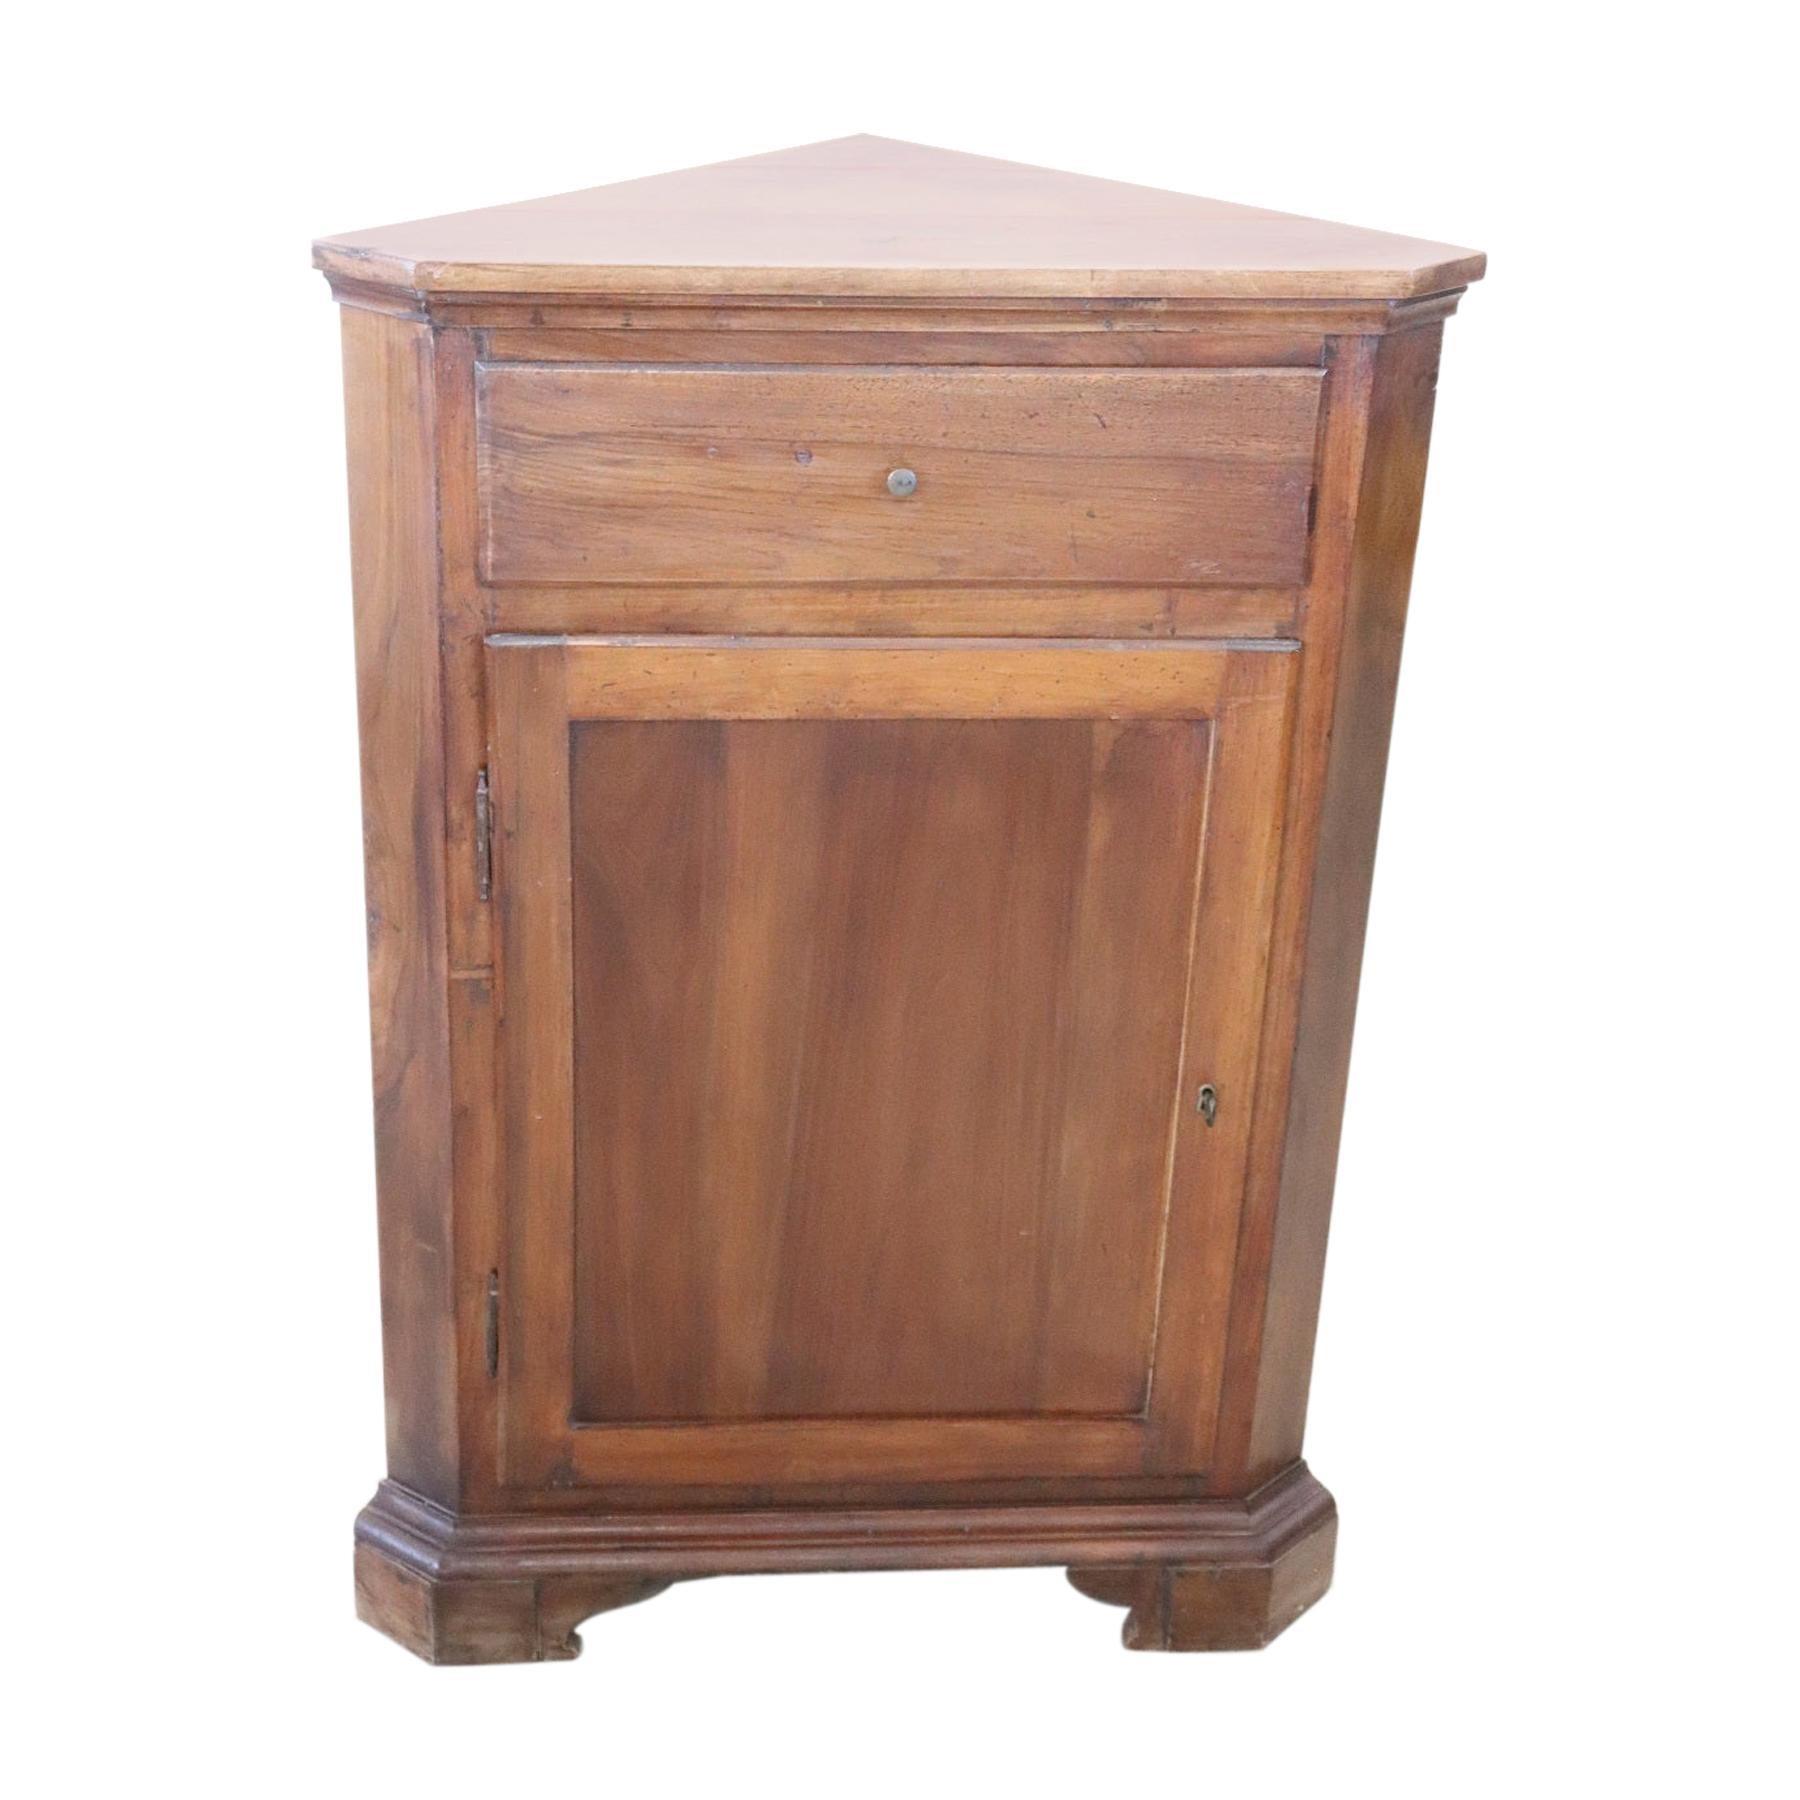 20th Century Italian Corner Cupboard or Corner Cabinet in Walnut Wood